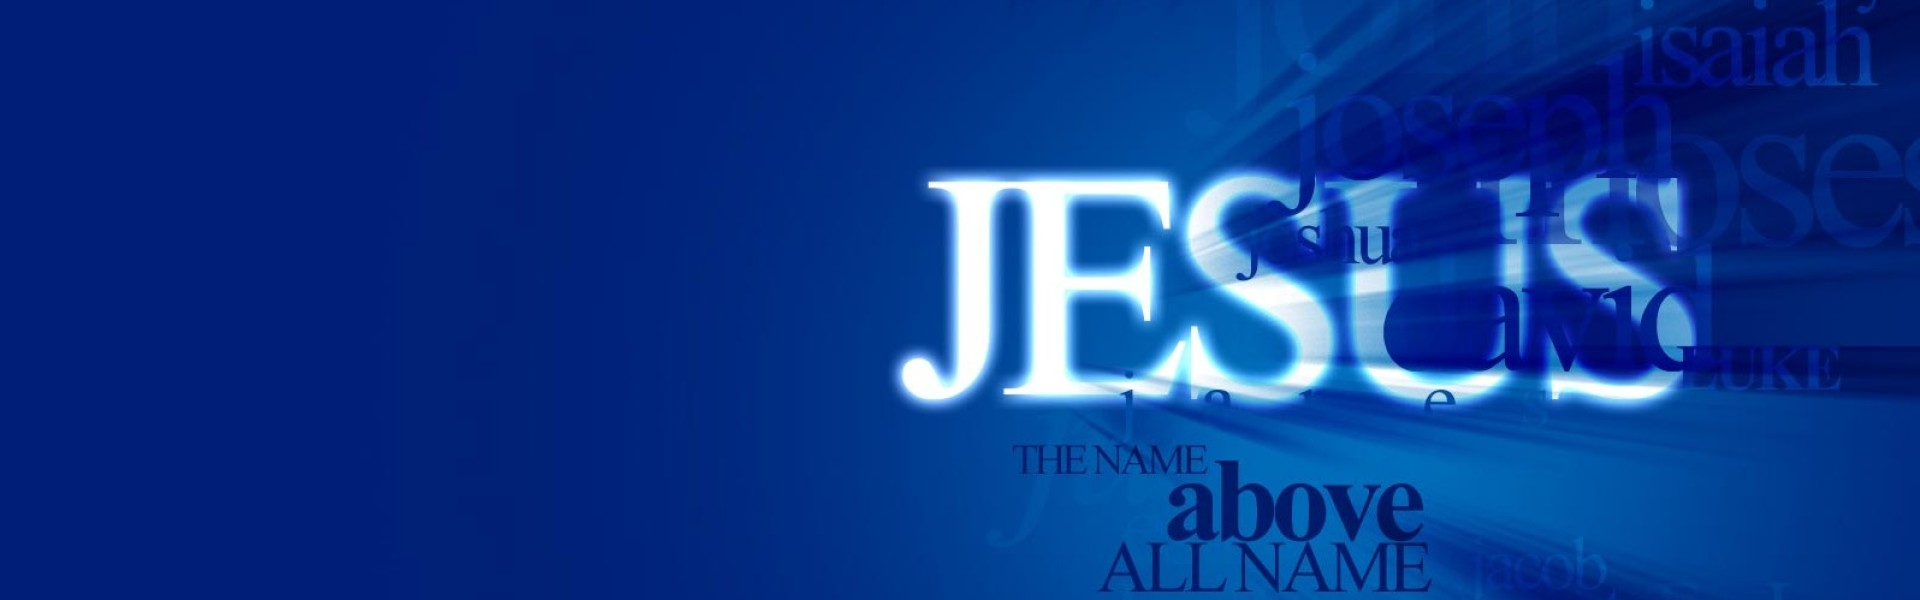 Jesus Told Me